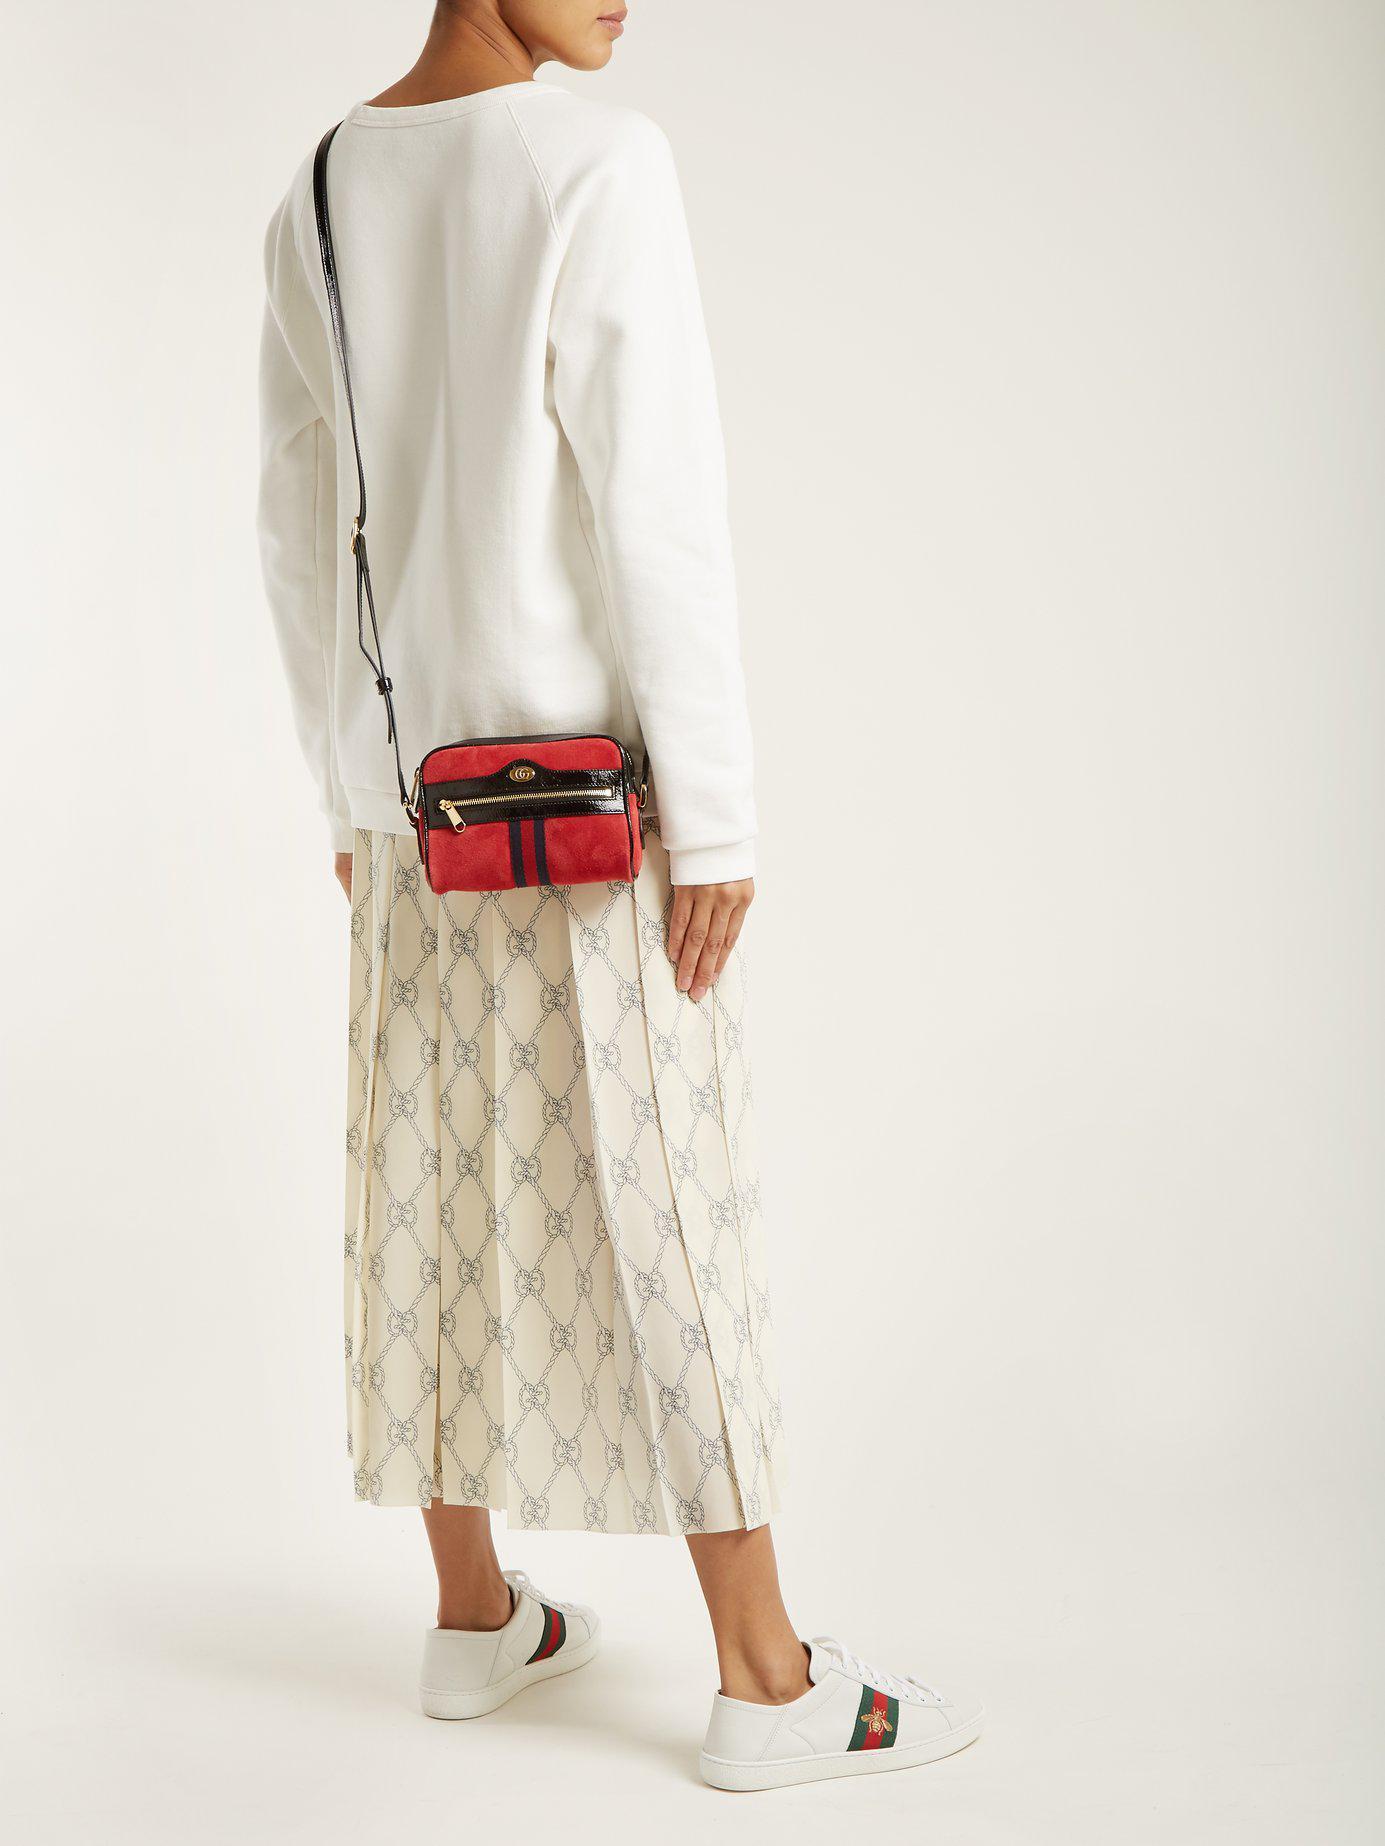 8a2a8390befc Gucci - Red Ophidia Mini Suede Cross Body Bag - Lyst. View fullscreen